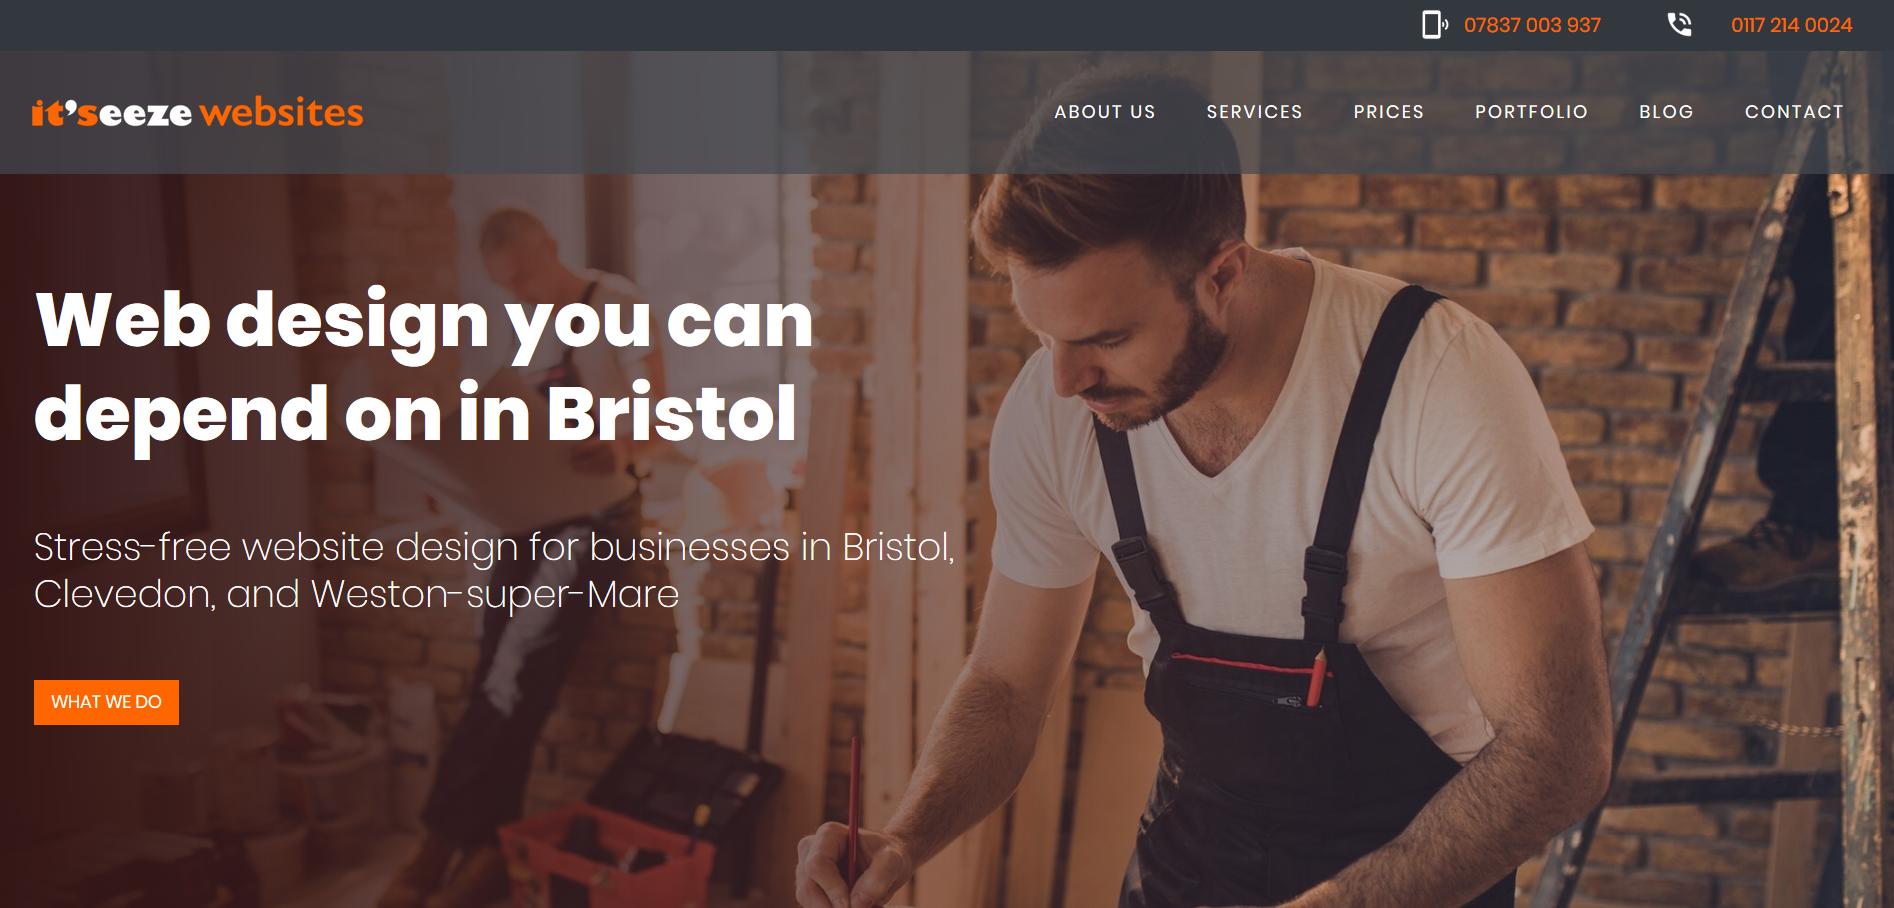 It Seeze Web Design Bristol Web Design Weston Super Mare